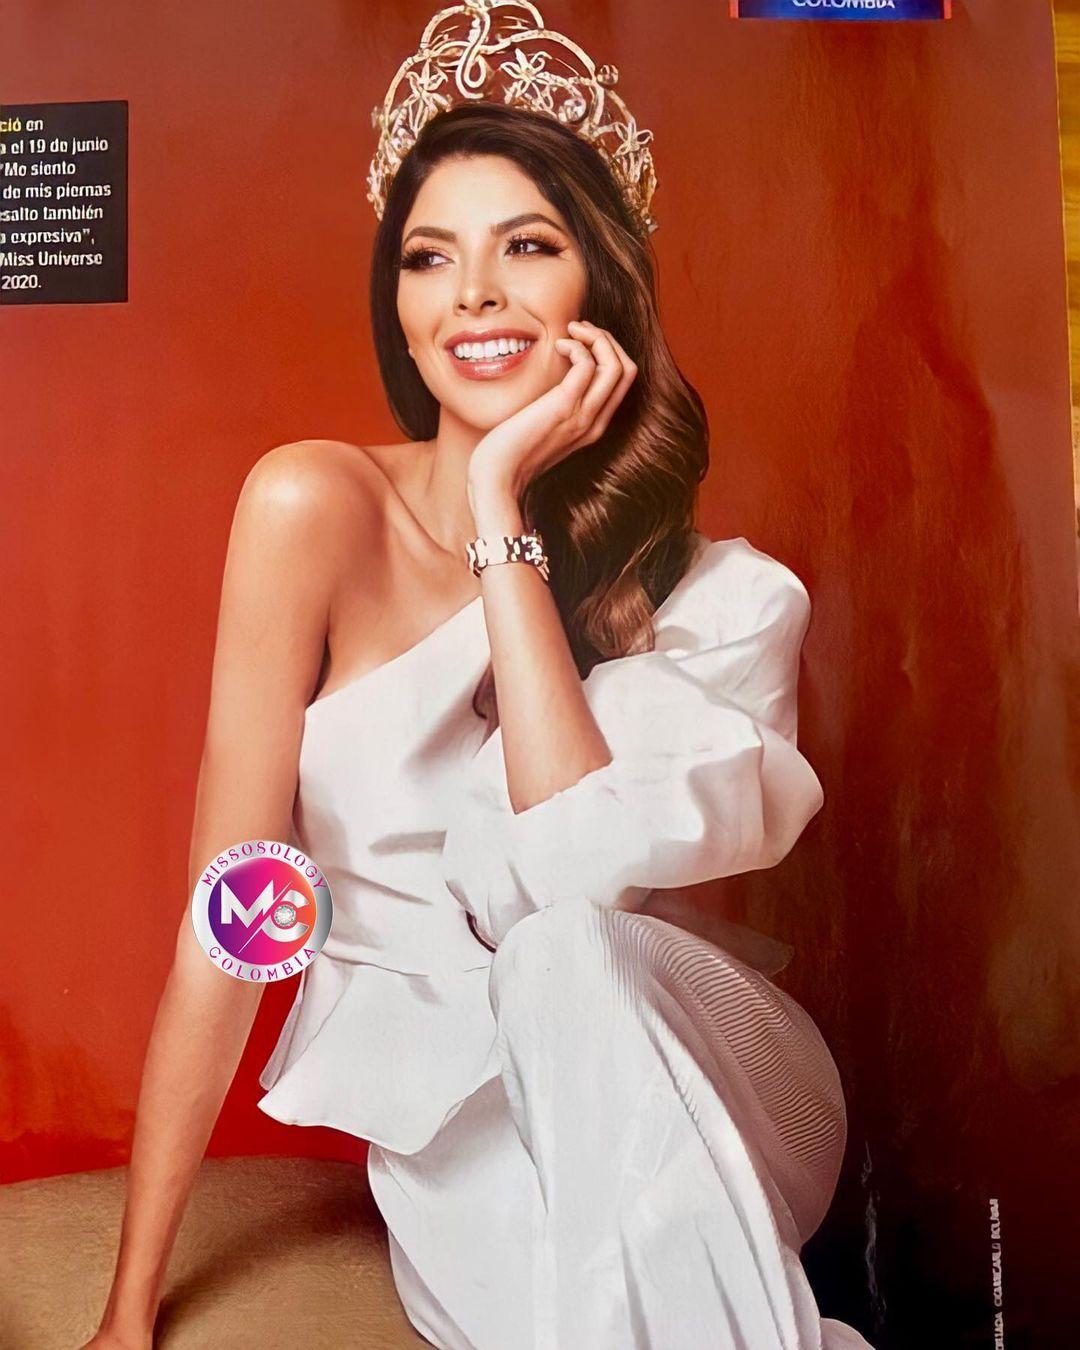 laura olascuaga, miss colombia universo 2020. - Página 6 Missos27